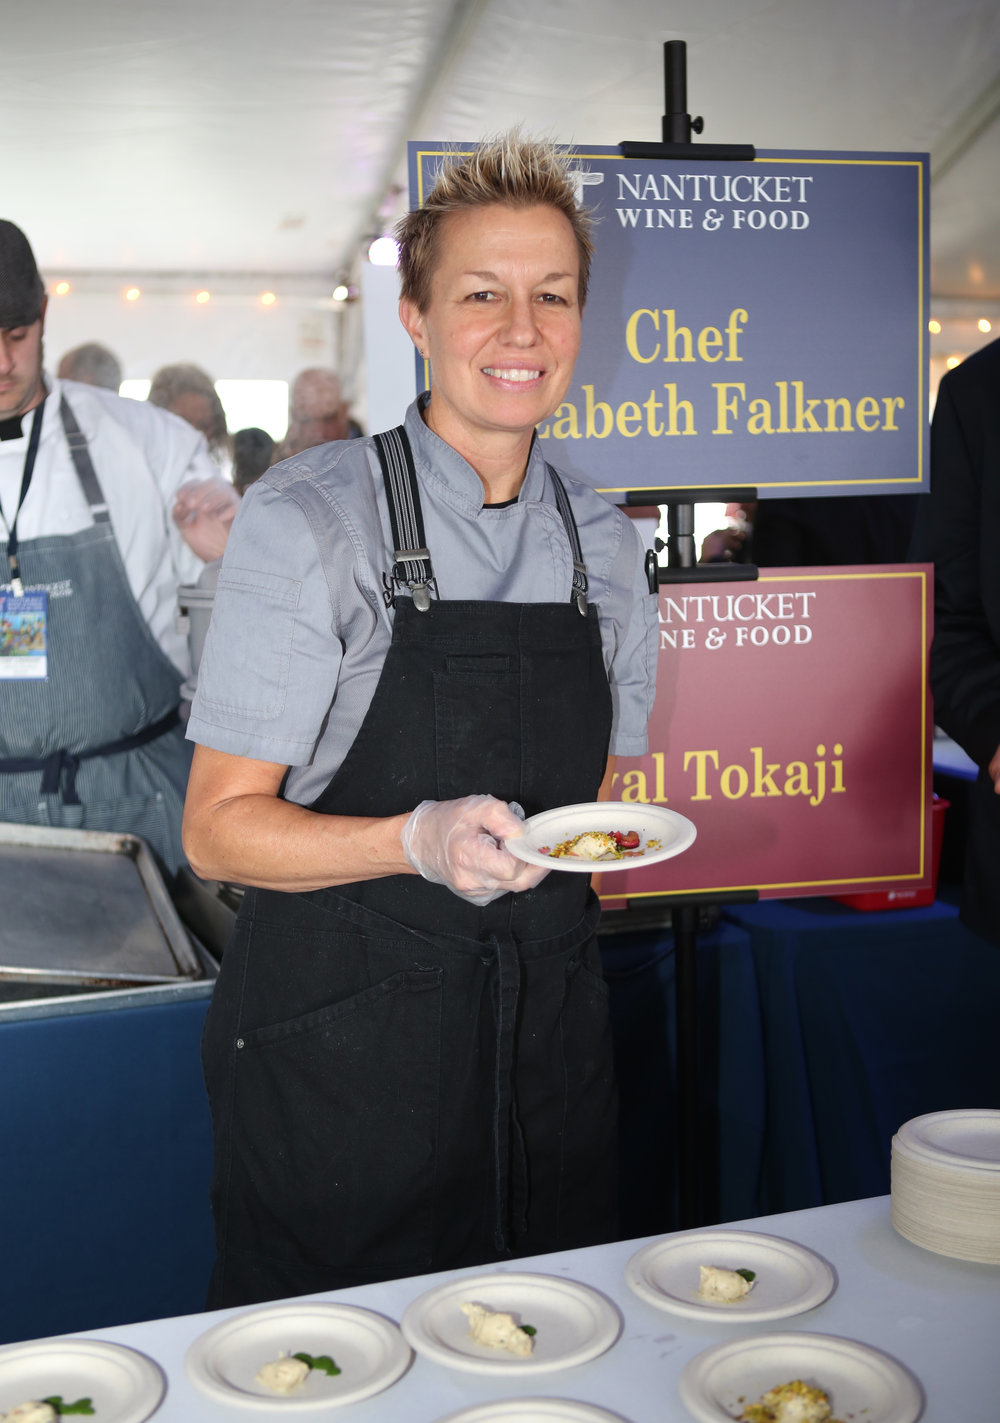 Chef - Elizabeth Falkner.JPG